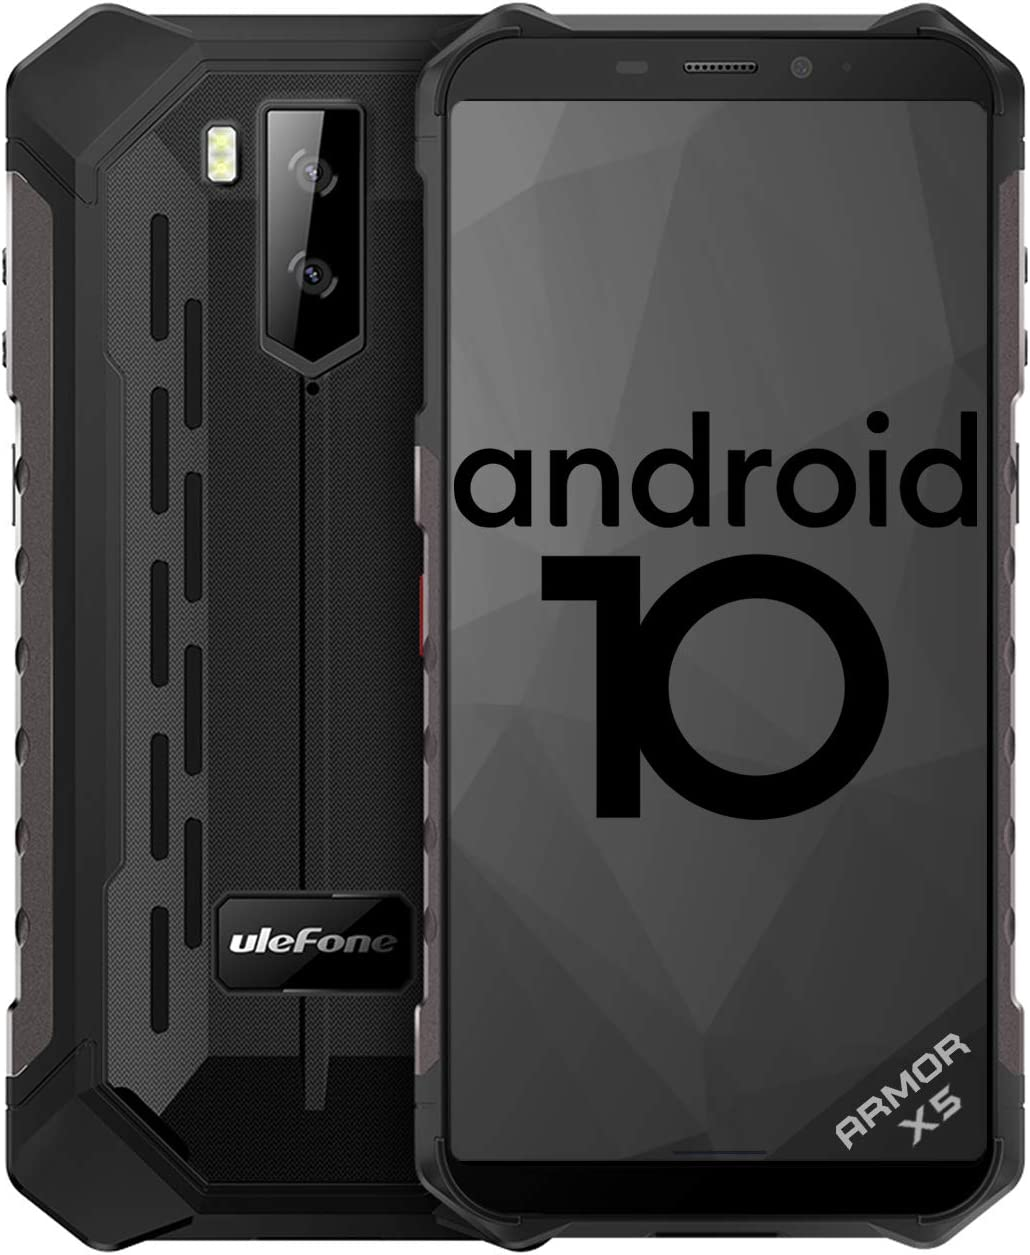 【2020】Telefono Móvil Libre Resistente,Ulefone Armor X5 Android 10 4G Octa-core 3GB+32GB - 5.5'' HD Resistente IP68 Impermeable Smartphone, Cámara 13MP+2MP,5000mAh batería, Dual SIM,GPS,NFC,OTG -Negro